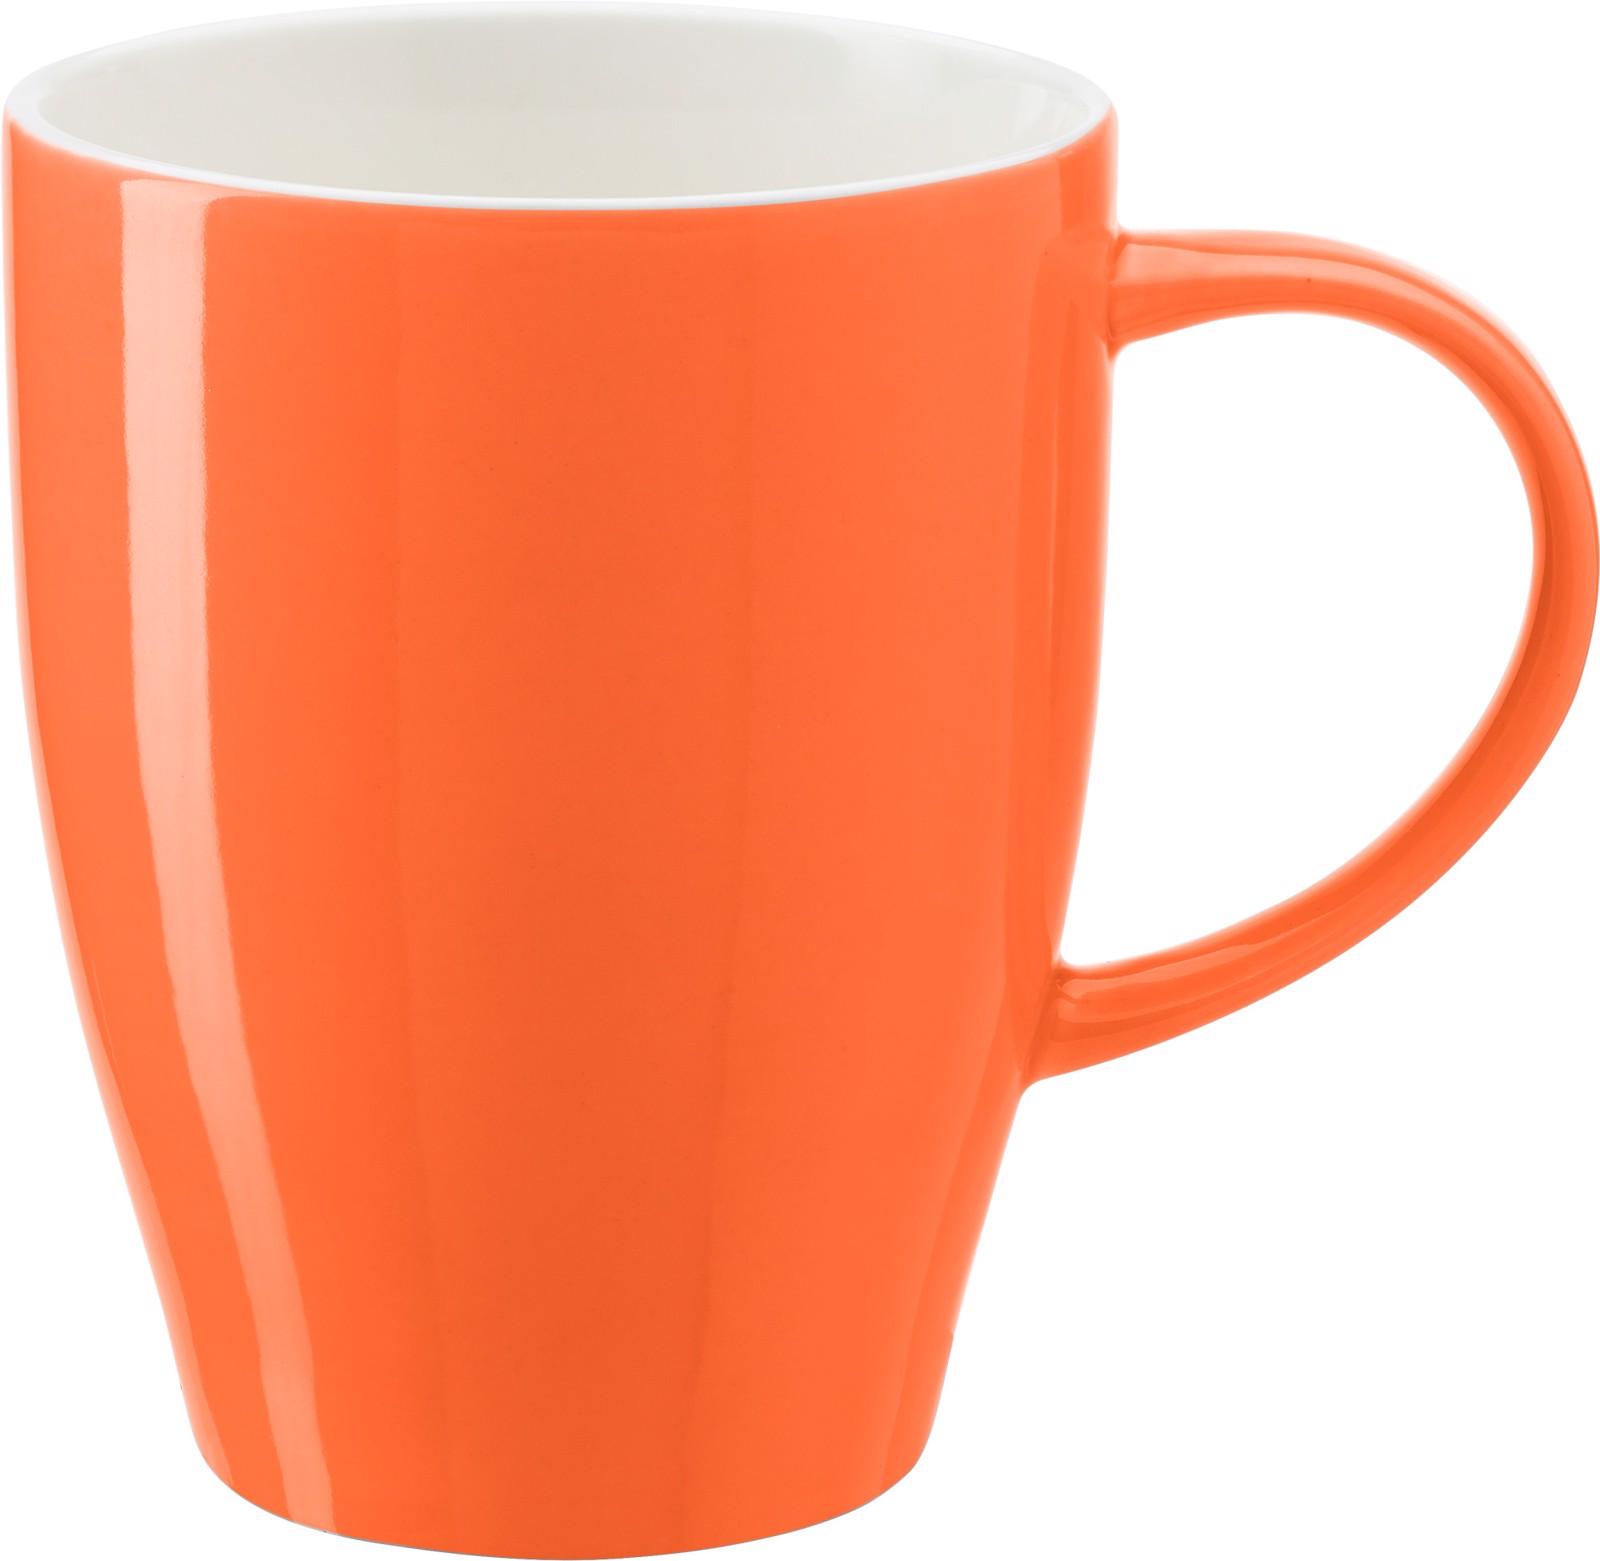 Porcelain mug - Orange